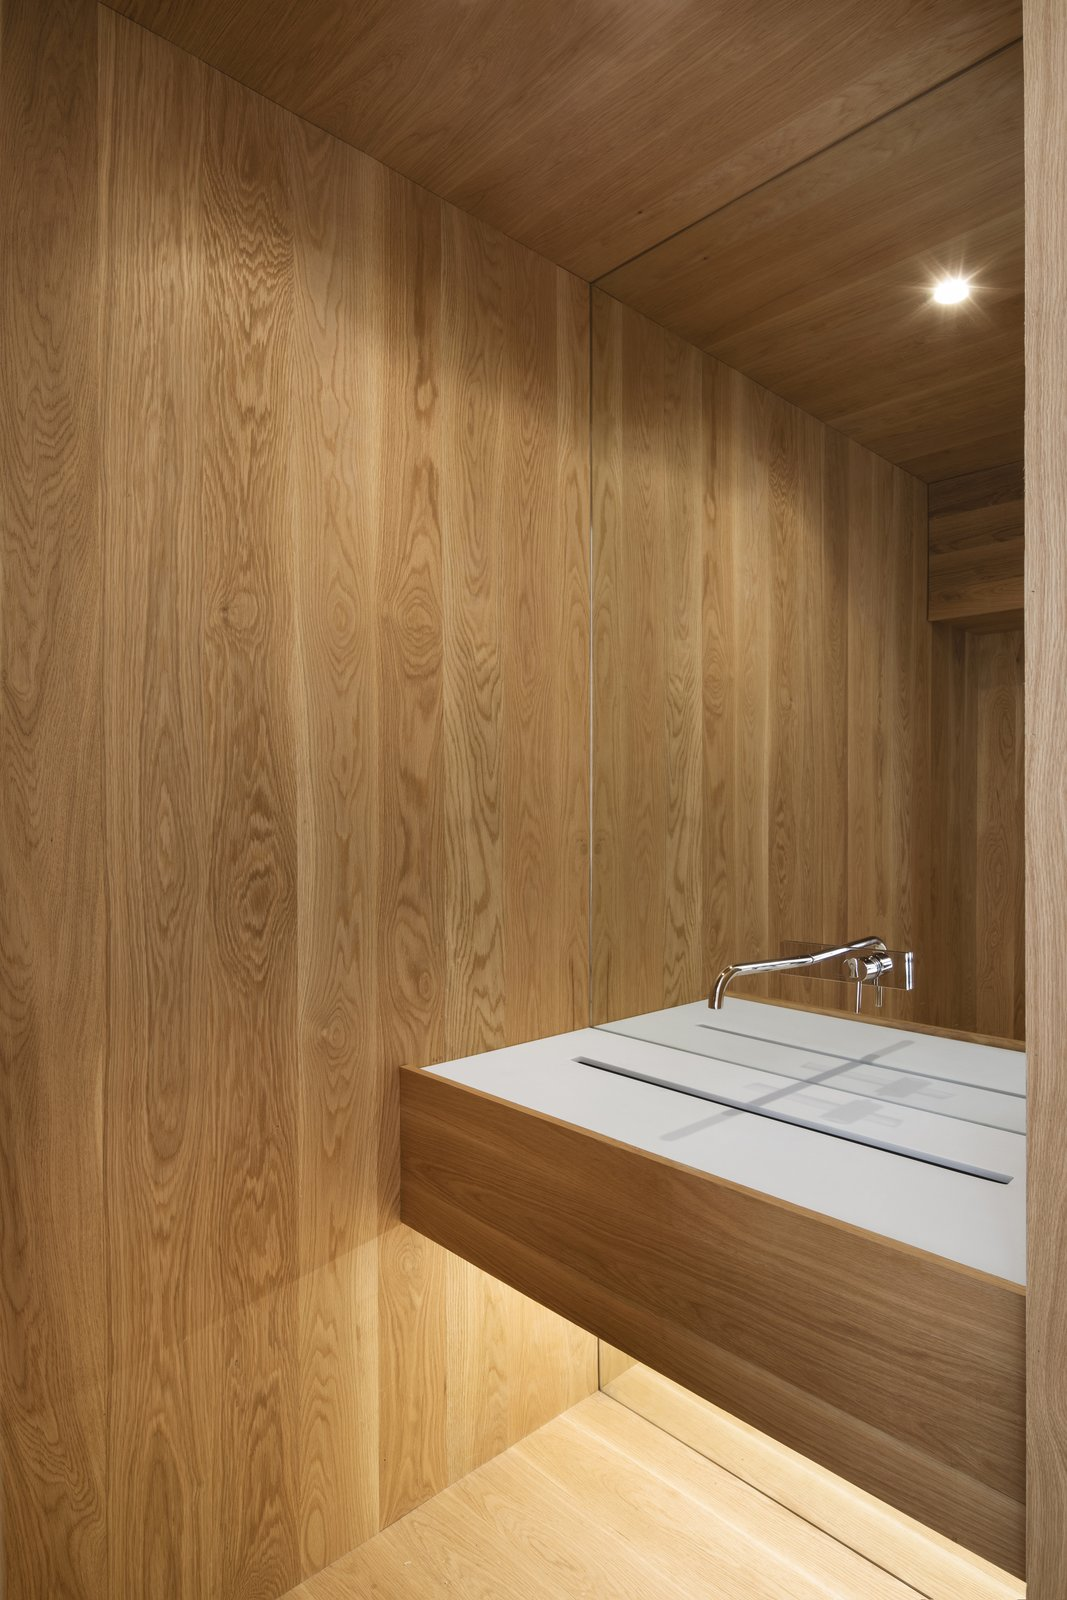 Bath Room, Medium Hardwood Floor, One Piece Toilet, Ceiling Lighting, and Undermount Sink  The House on Drolet Street